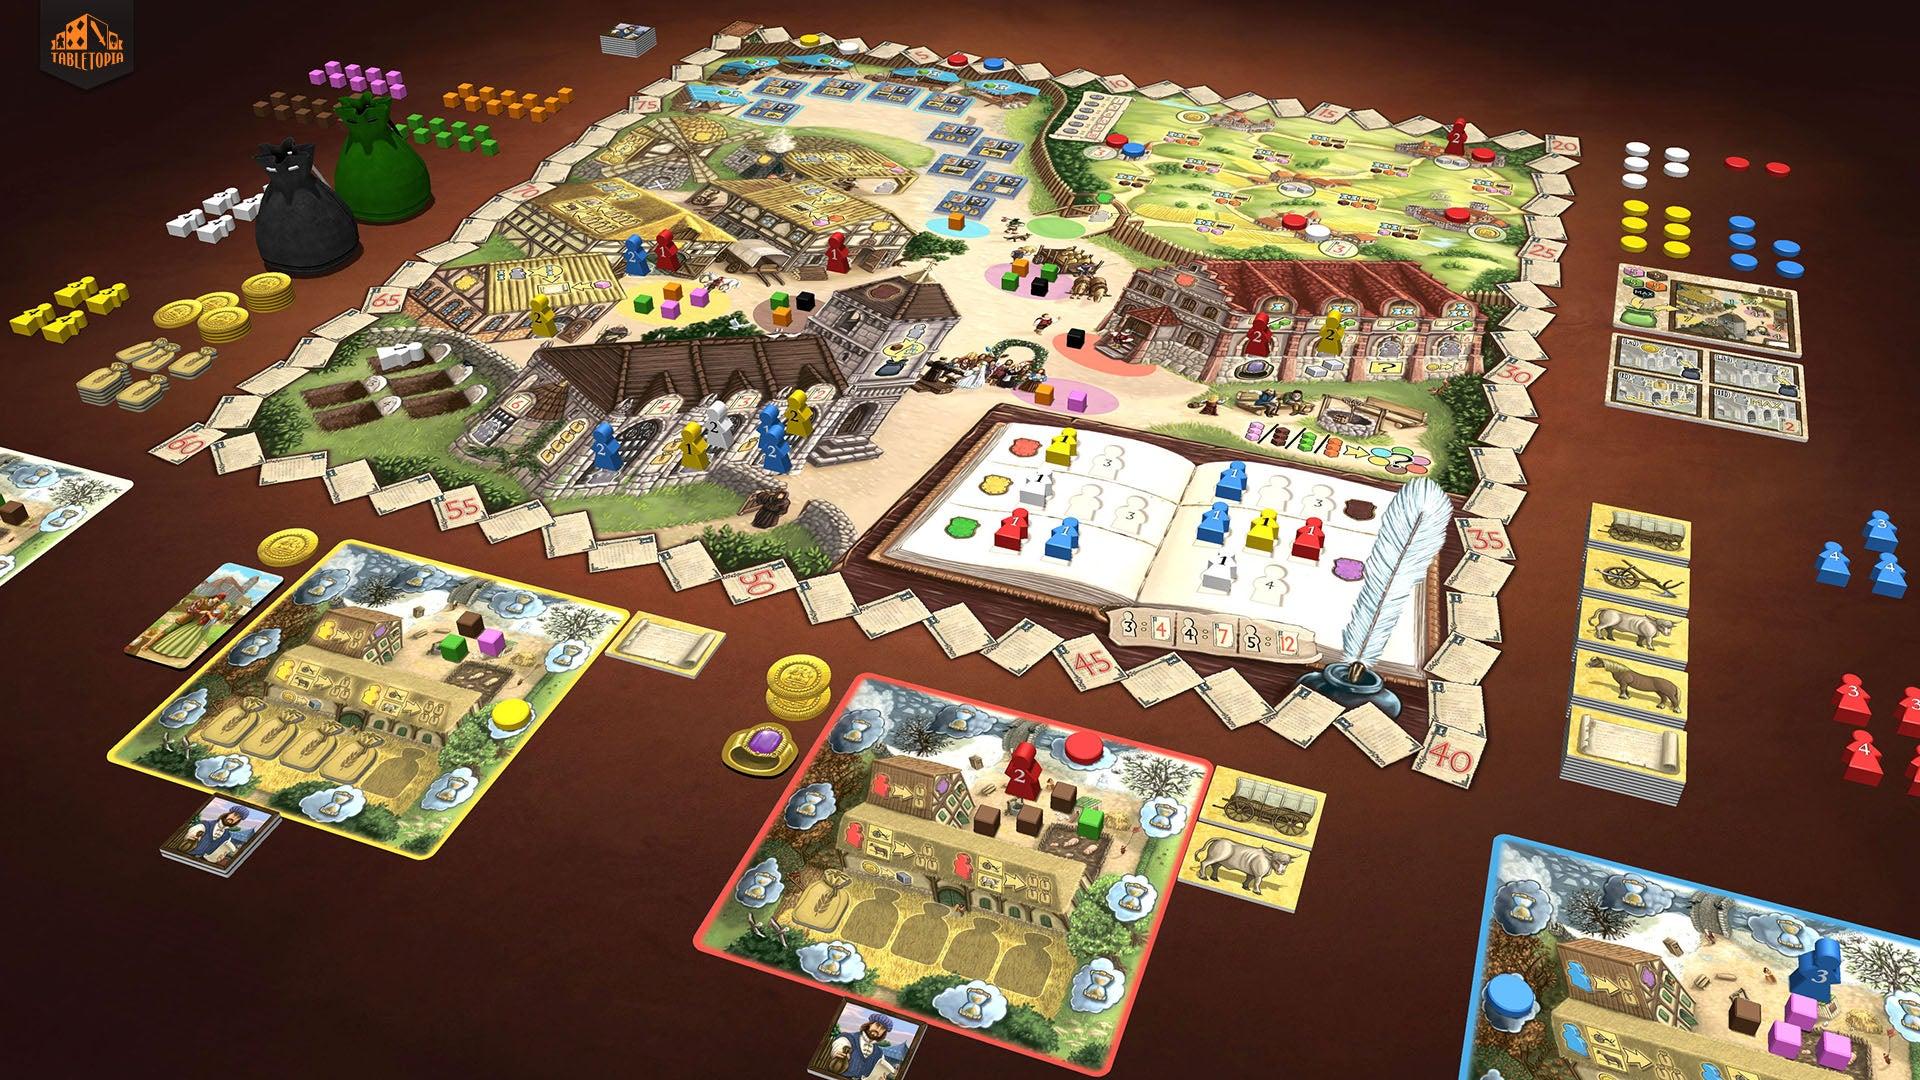 tabletopia-online-board-game.jpg